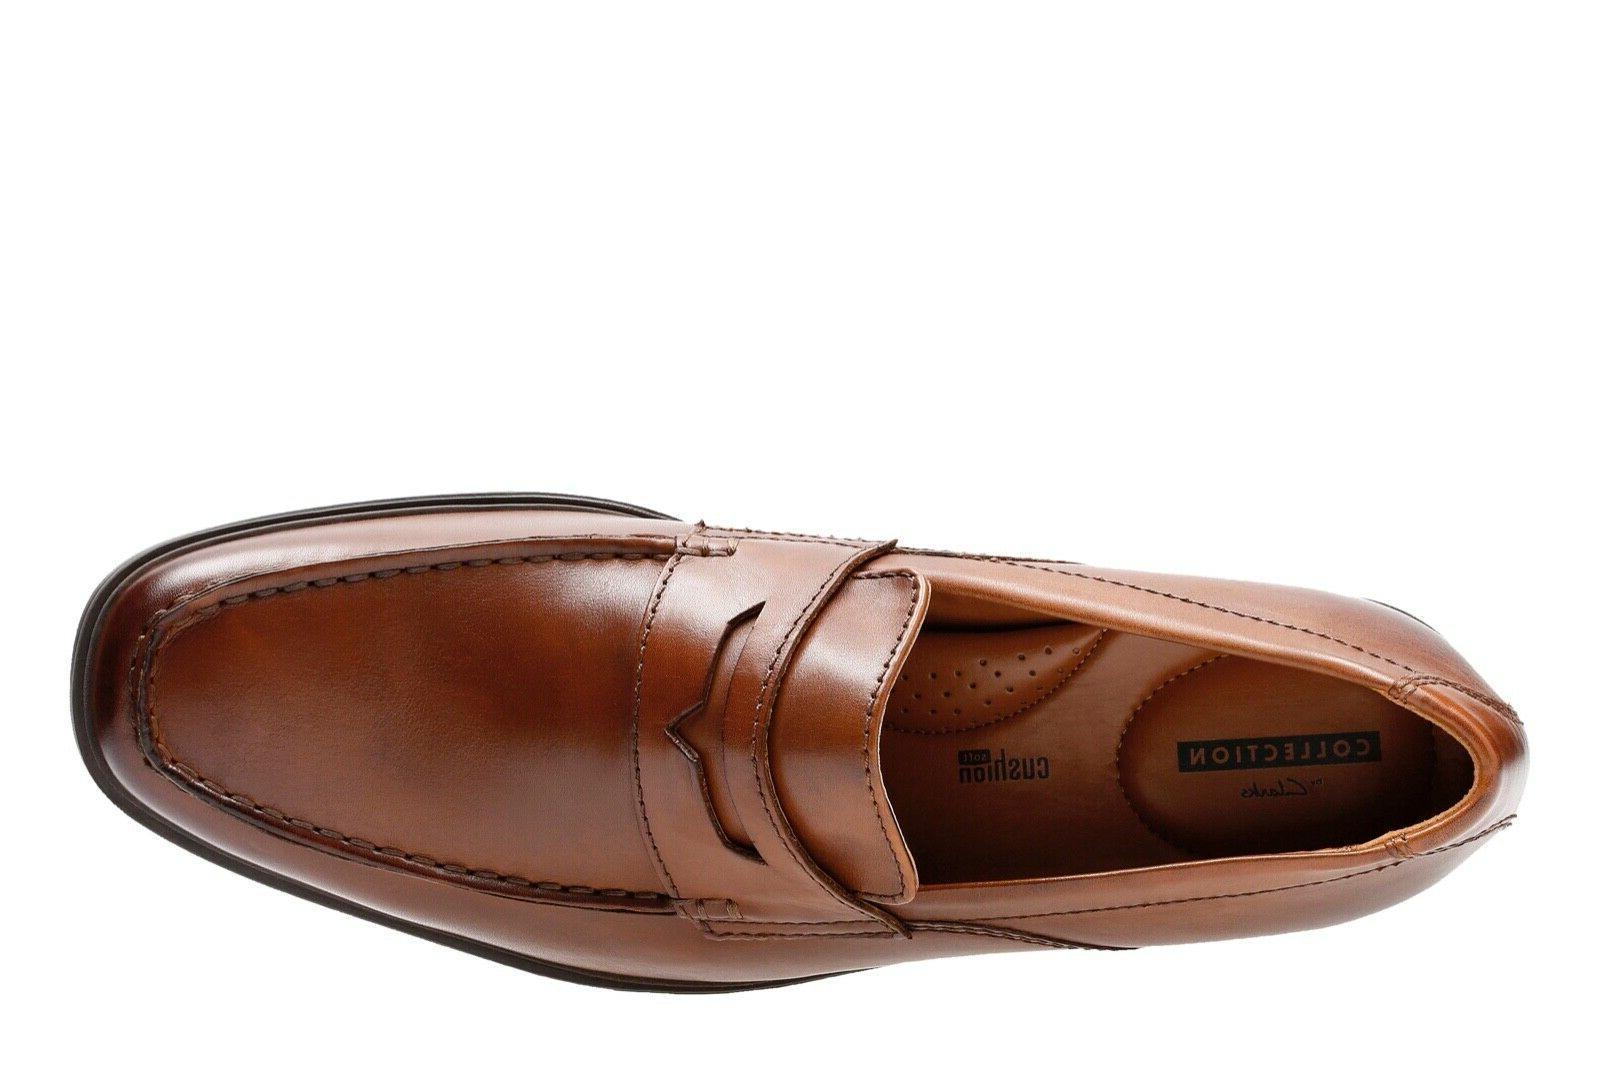 Clarks Men's Tan Leather 26131576